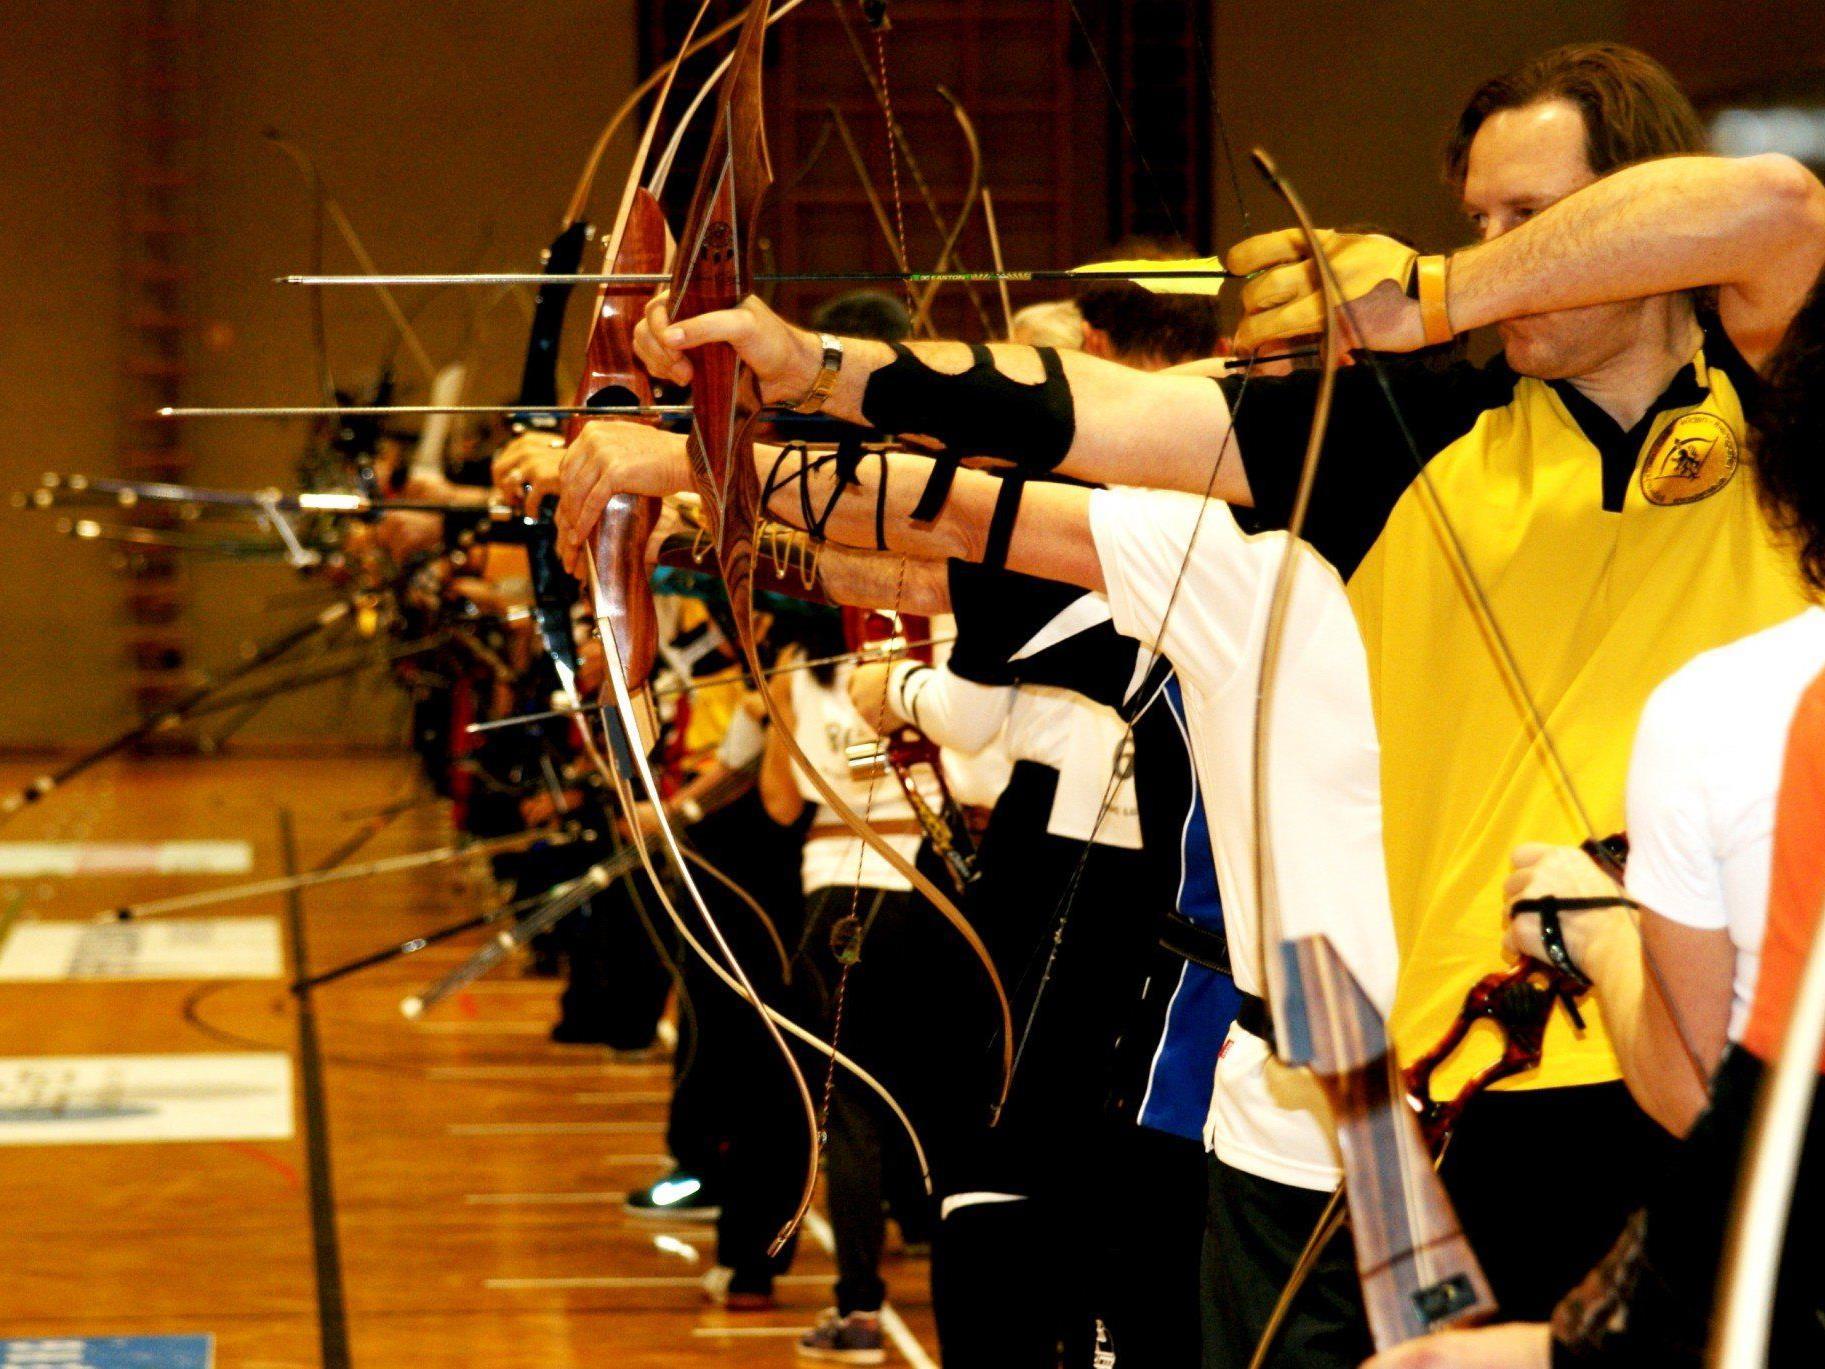 190 Bogenschützen nahmen am Turnier teil!